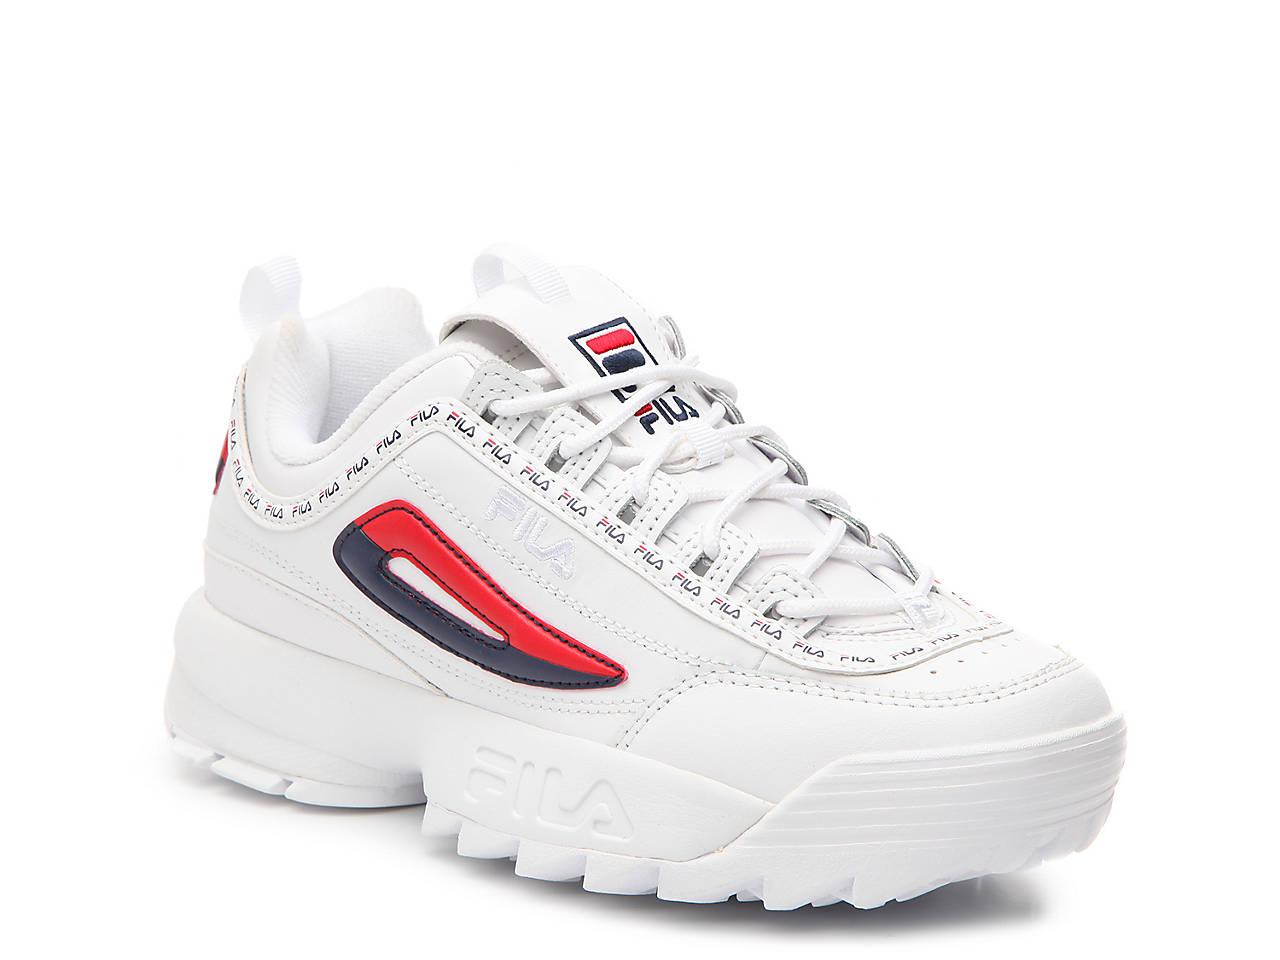 24b5d316c7c6d Fila Disruptor II Sneaker - Women s Women s Shoes